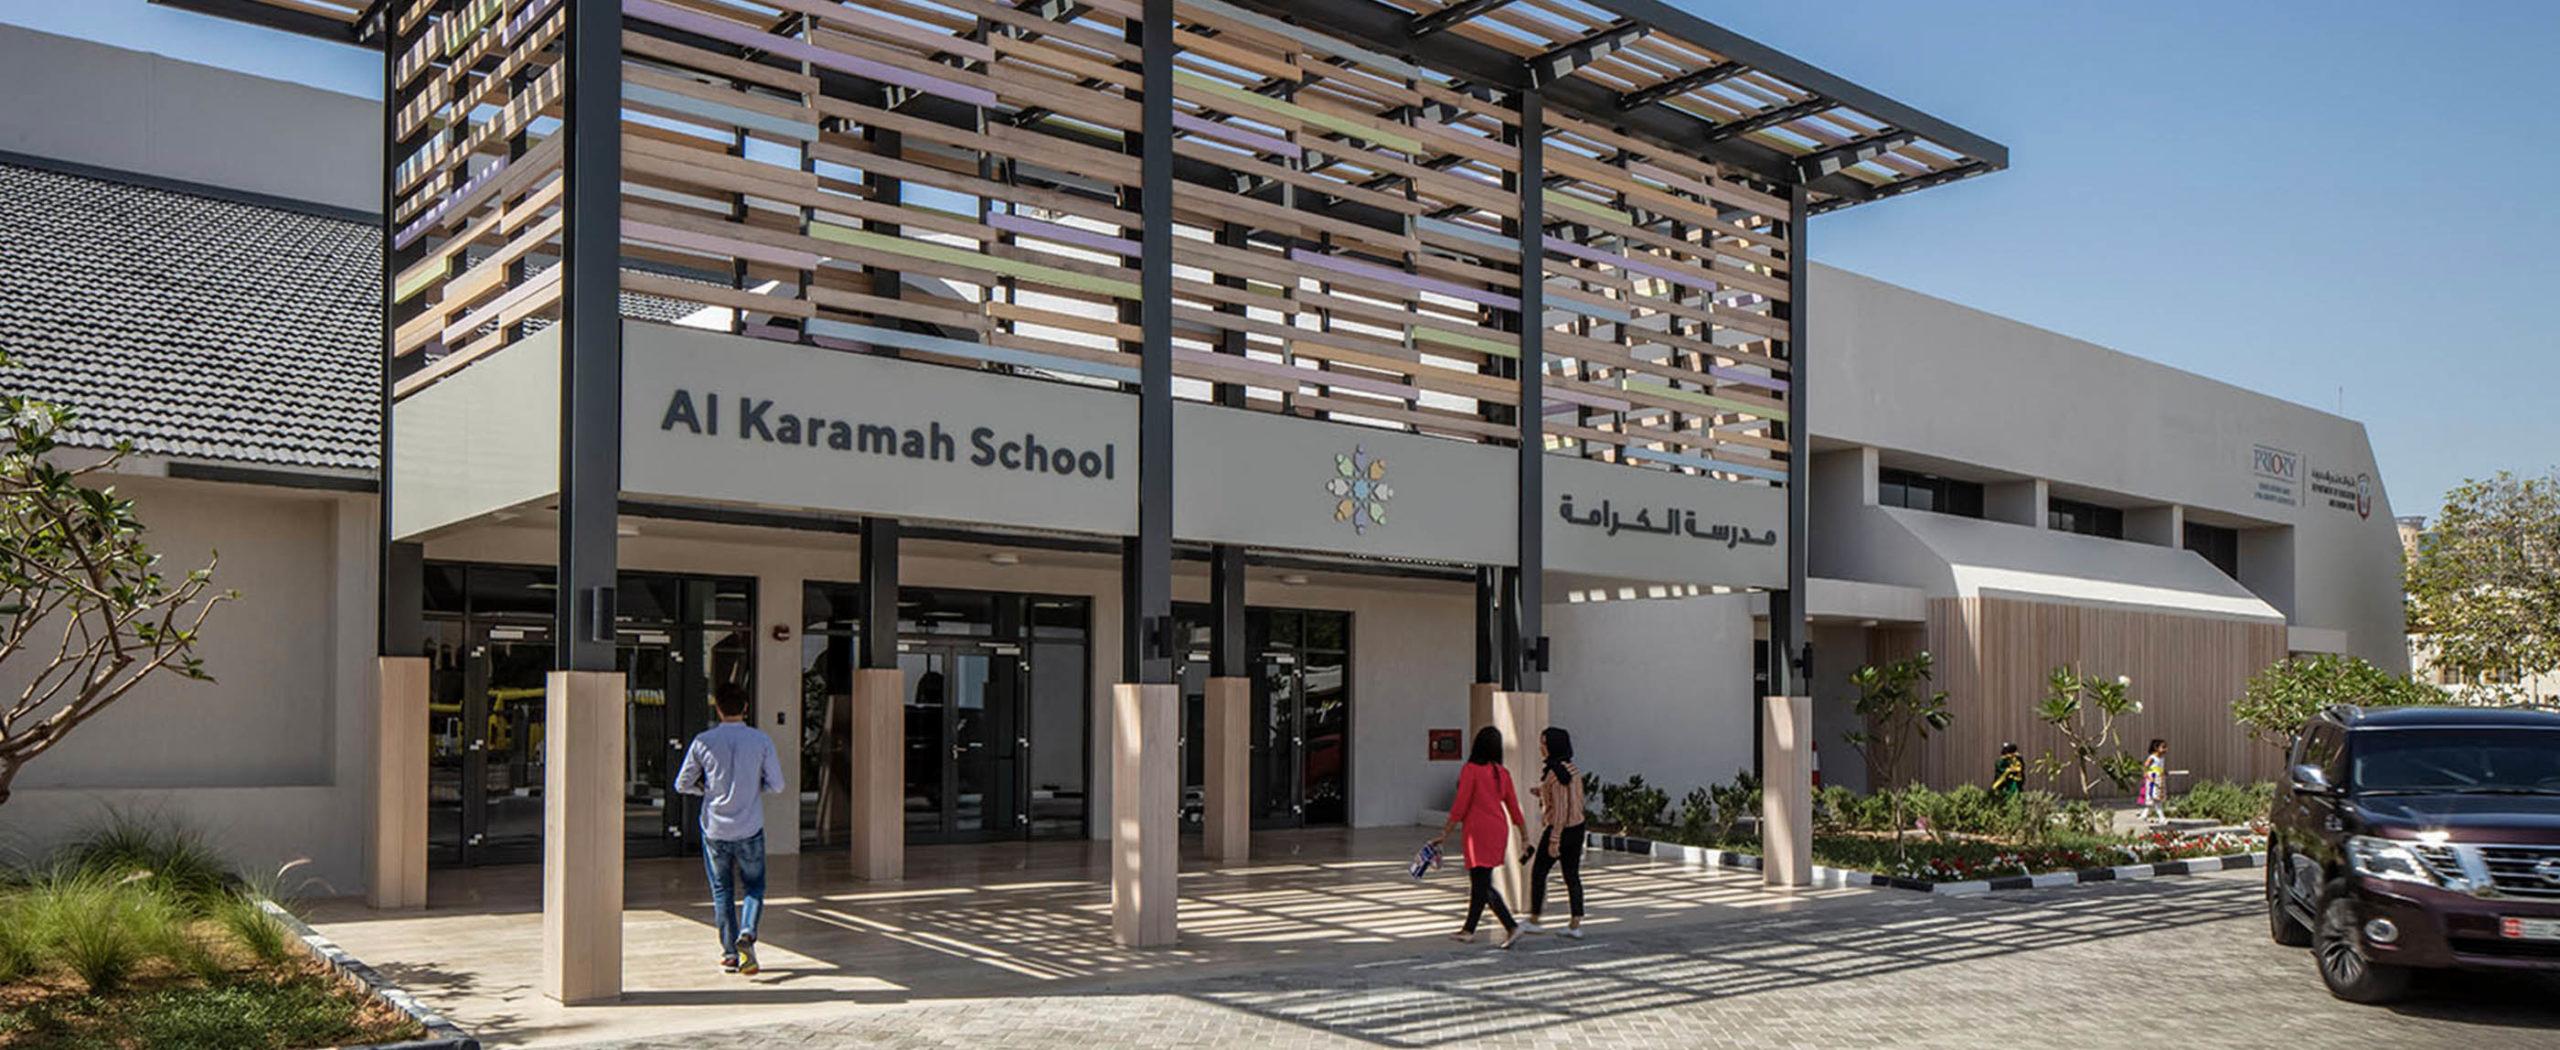 alkaramah-school-abu-dhabi-branding-header